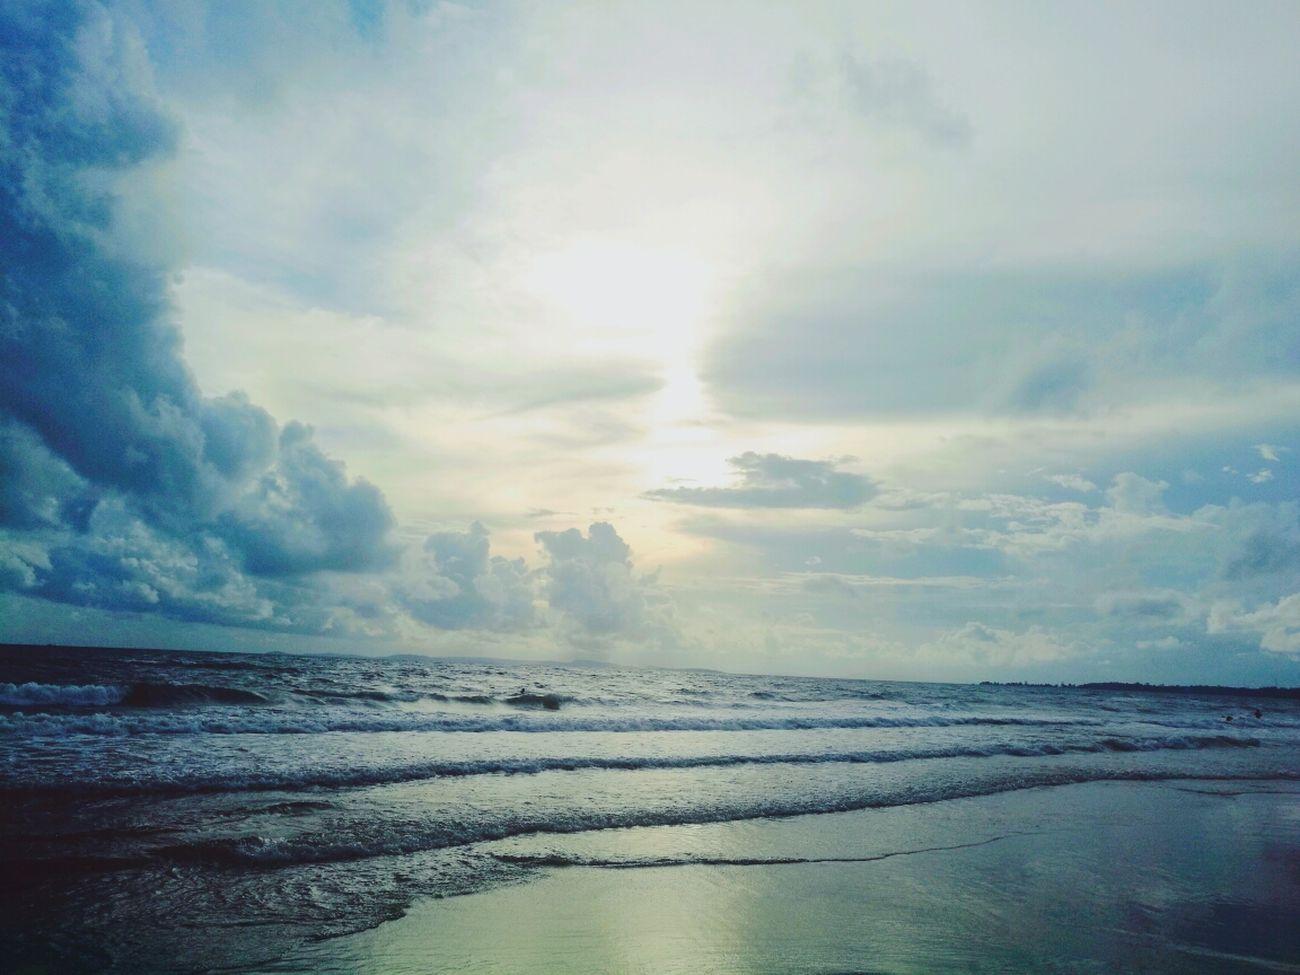 The Colour Of Life Beach Sihanouk Ville Province Cambodia